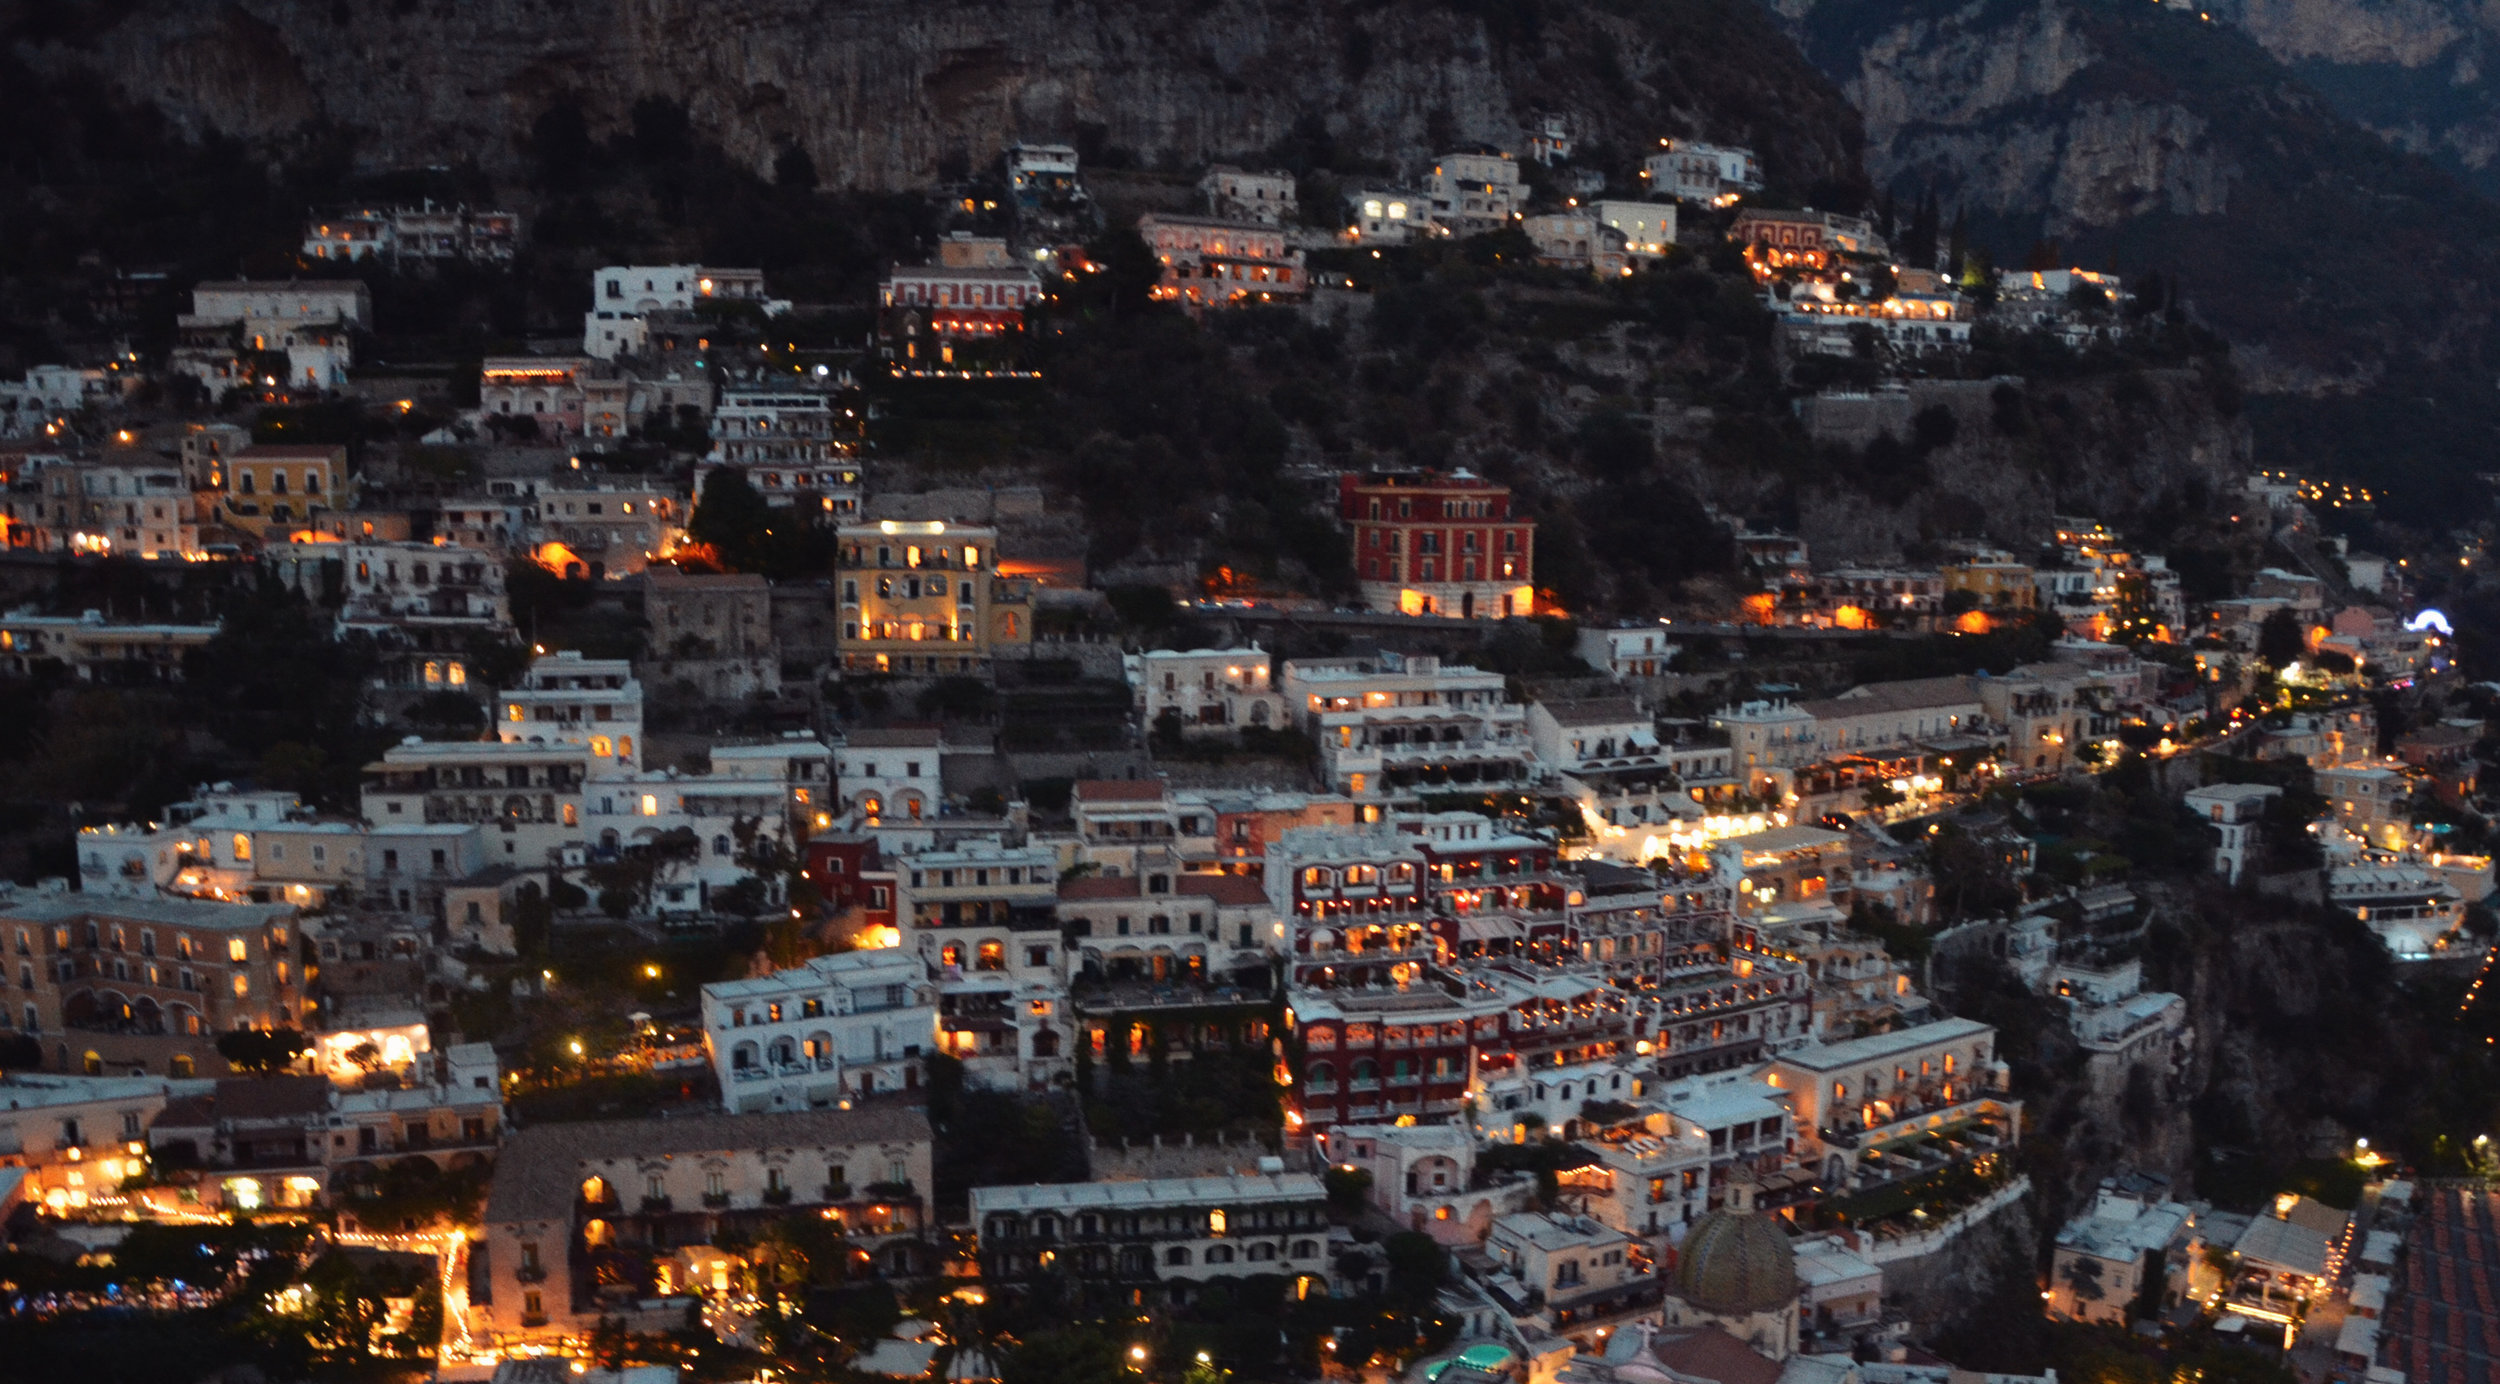 THE NIGHT LIGHTS OF POSITANO